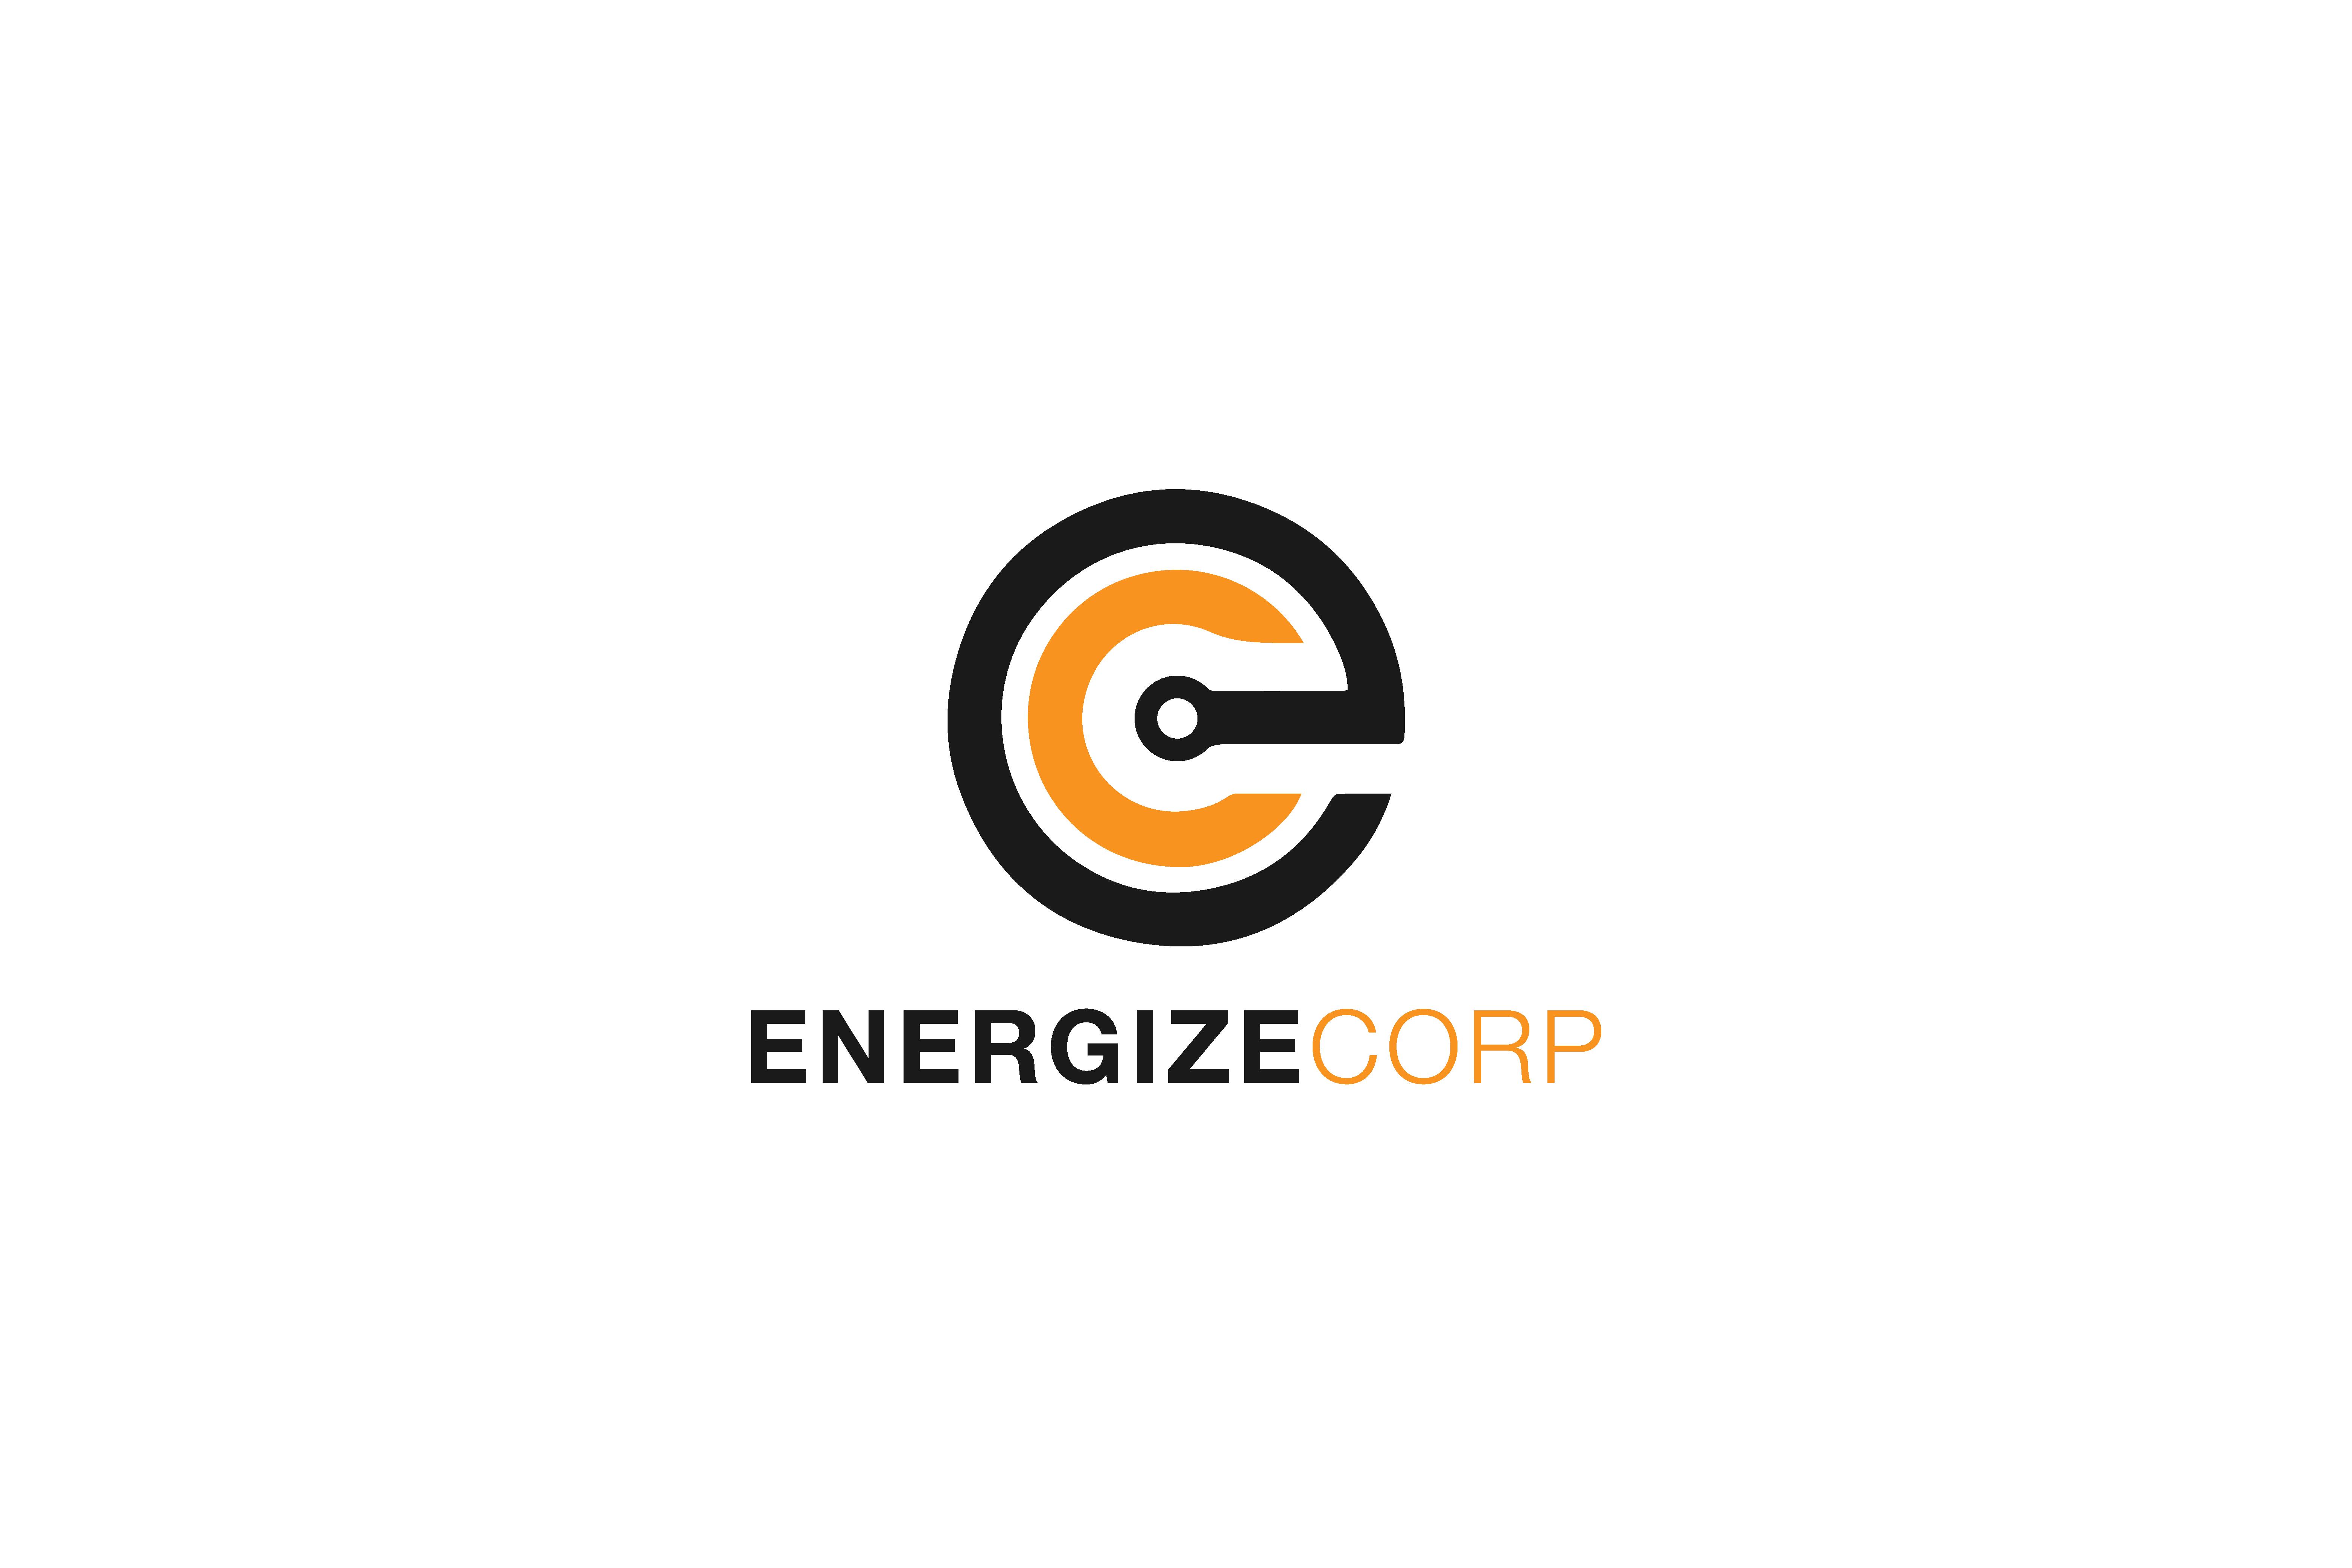 EnergizeCorp